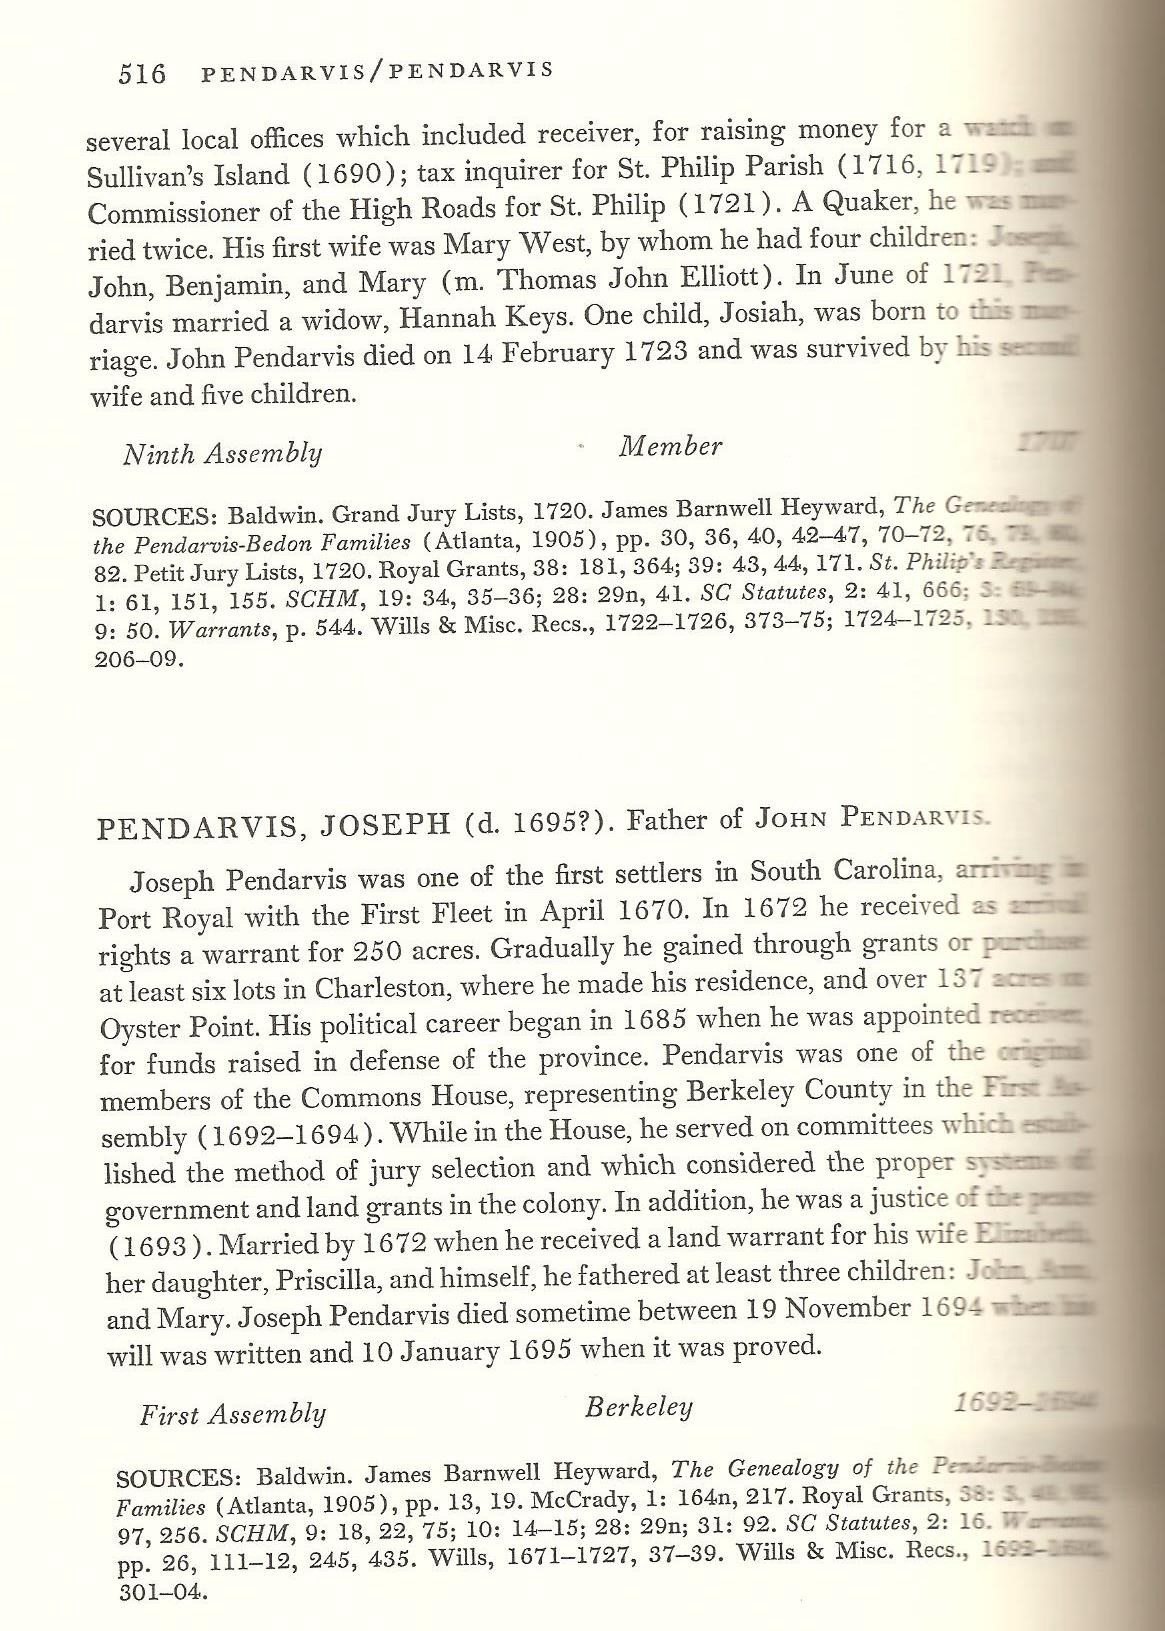 Joseph Pendarvis